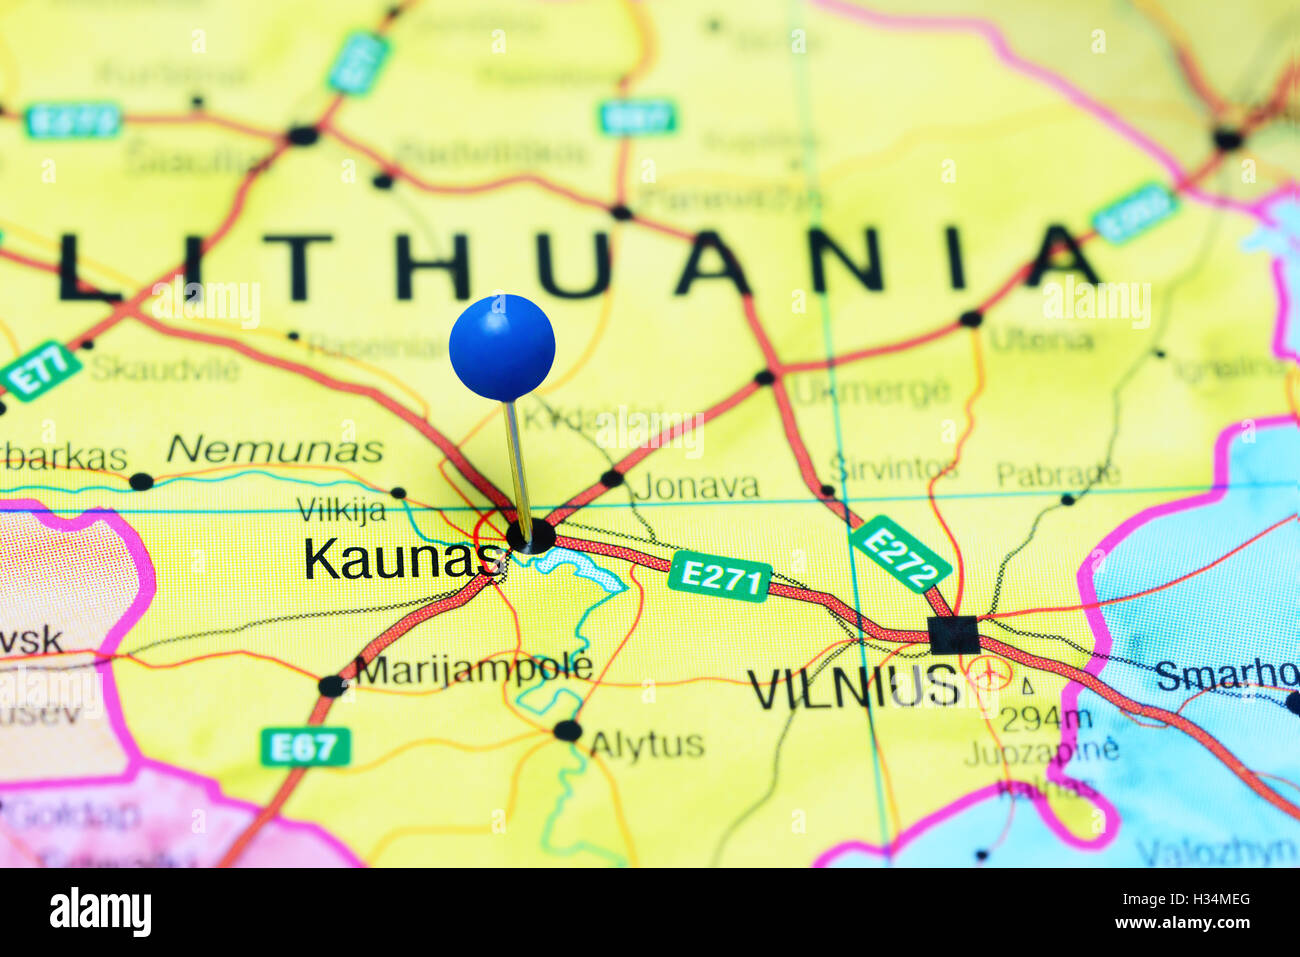 Kaunas Pinned On A Map Of Lithuania Stock Photo Royalty Free - Kaunas map